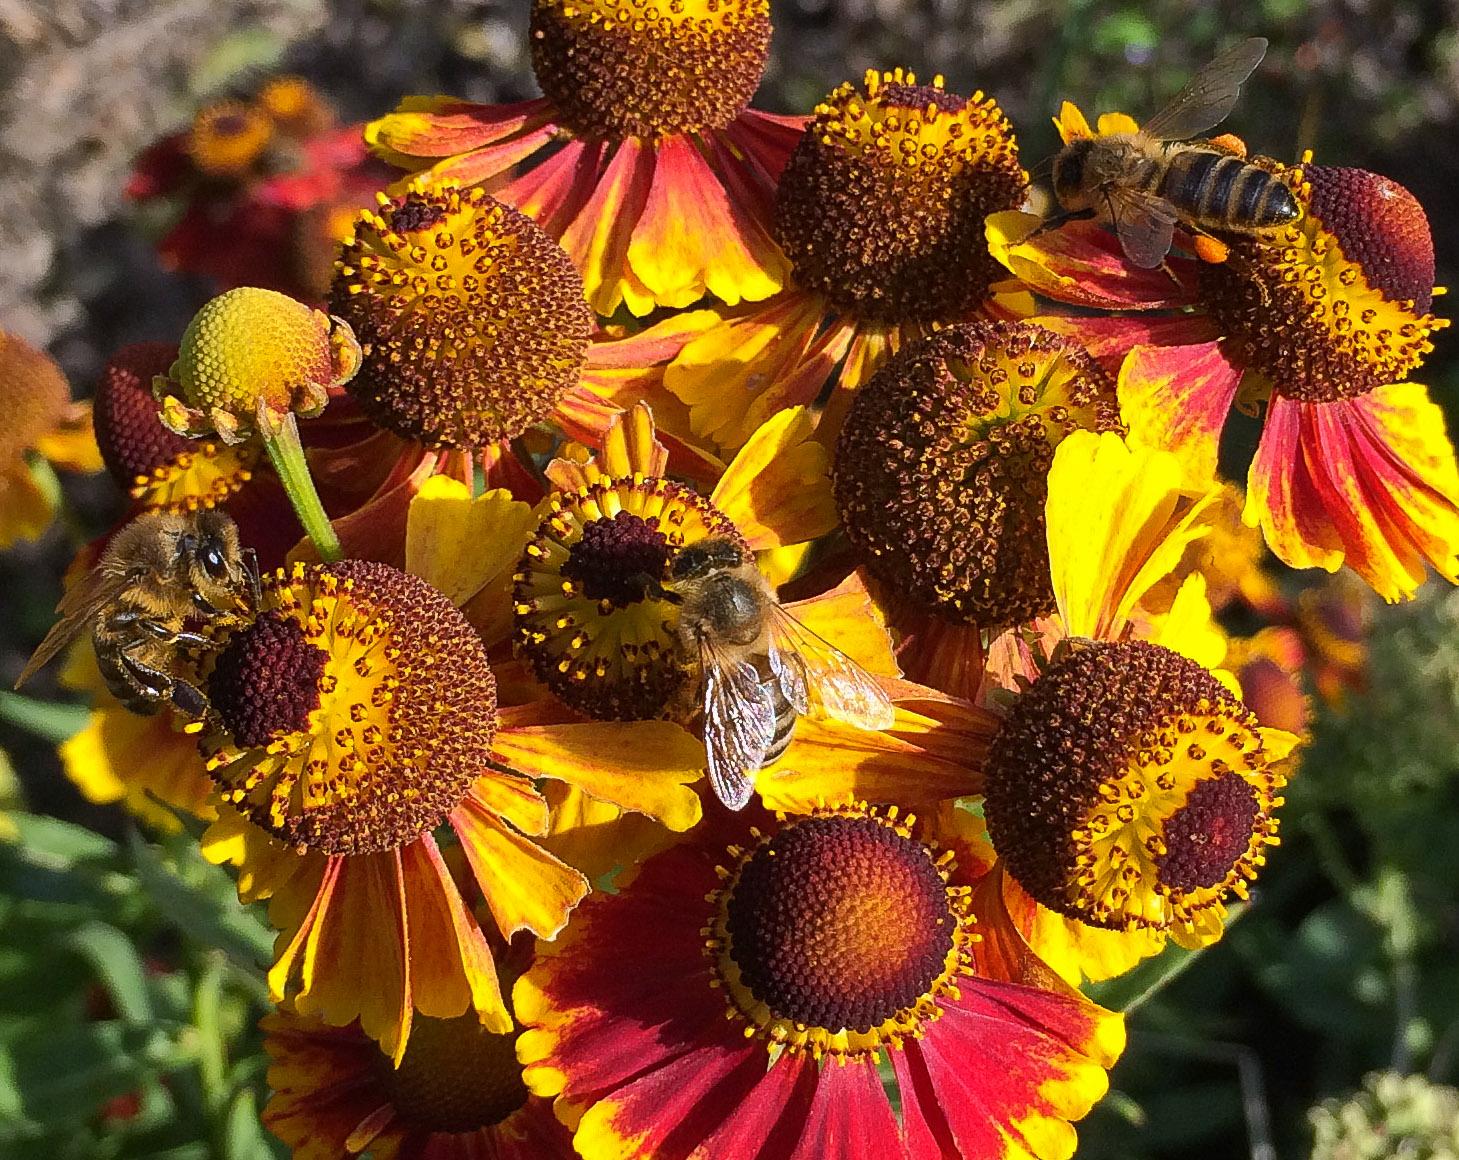 Three honey bees on just one helenium stem